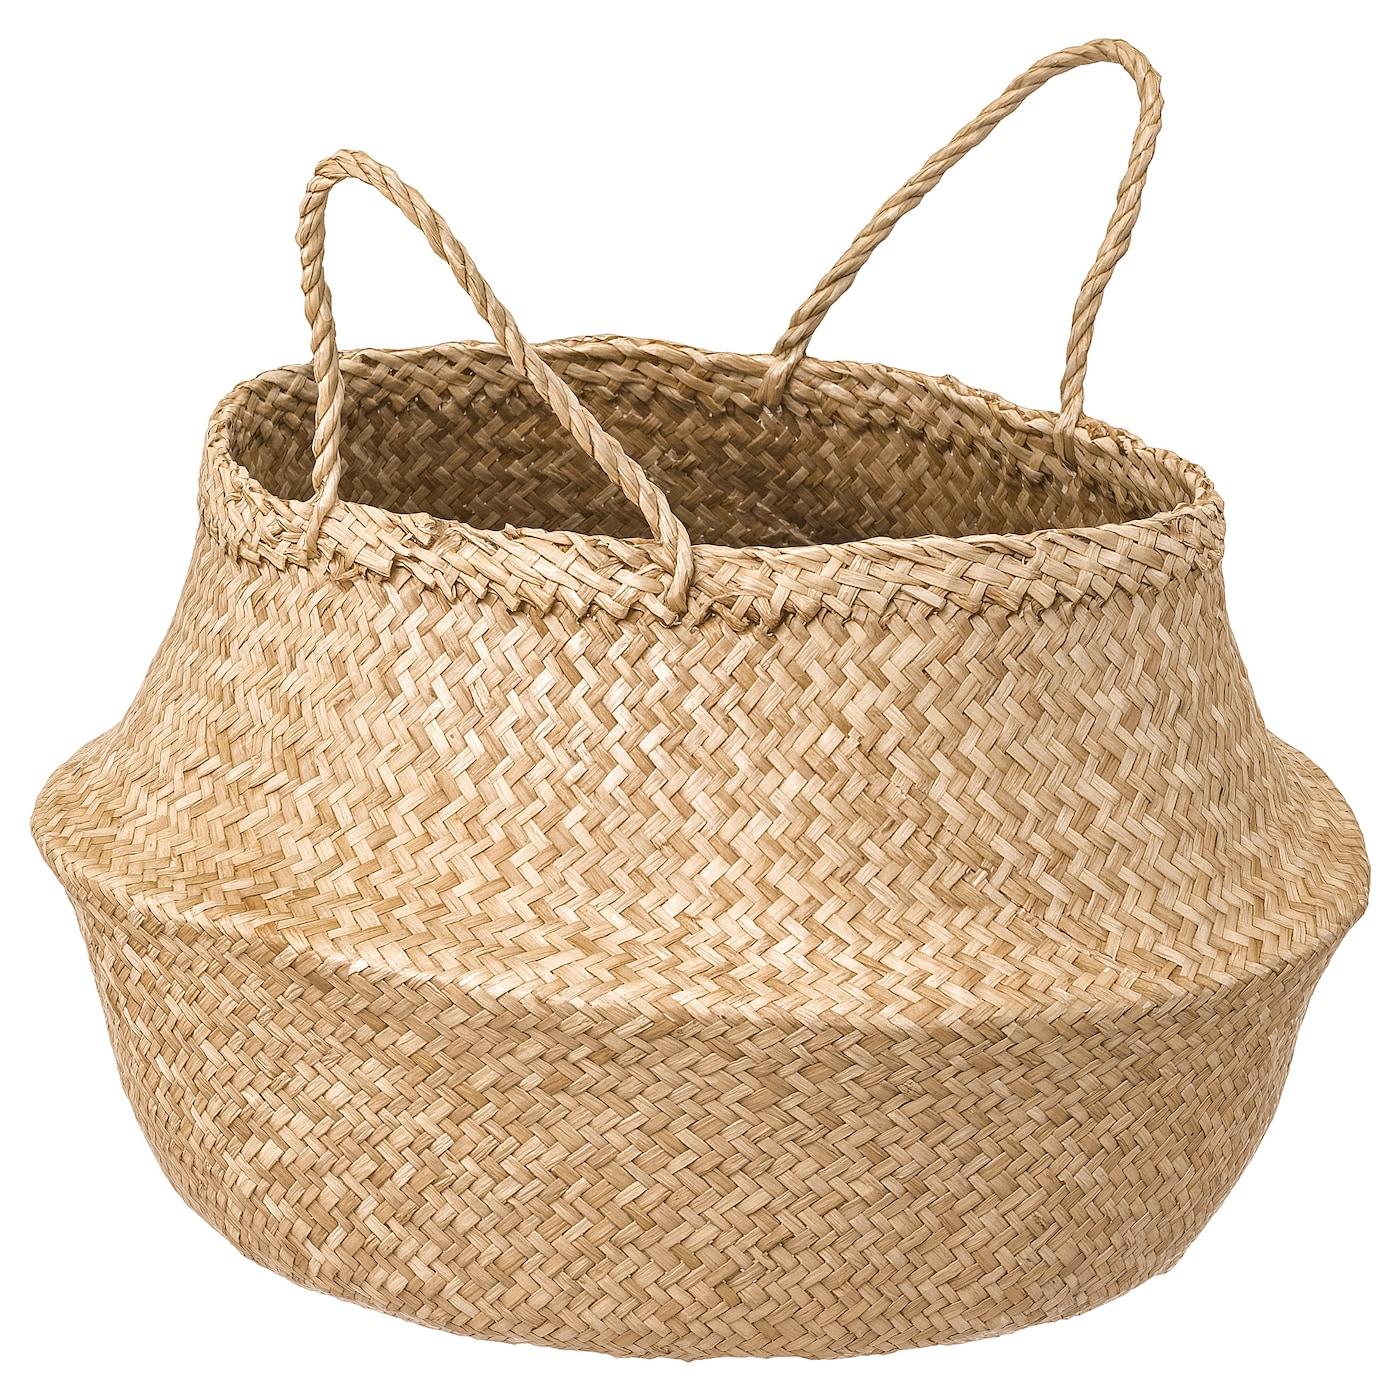 FLÅDIS フローディス バスケット